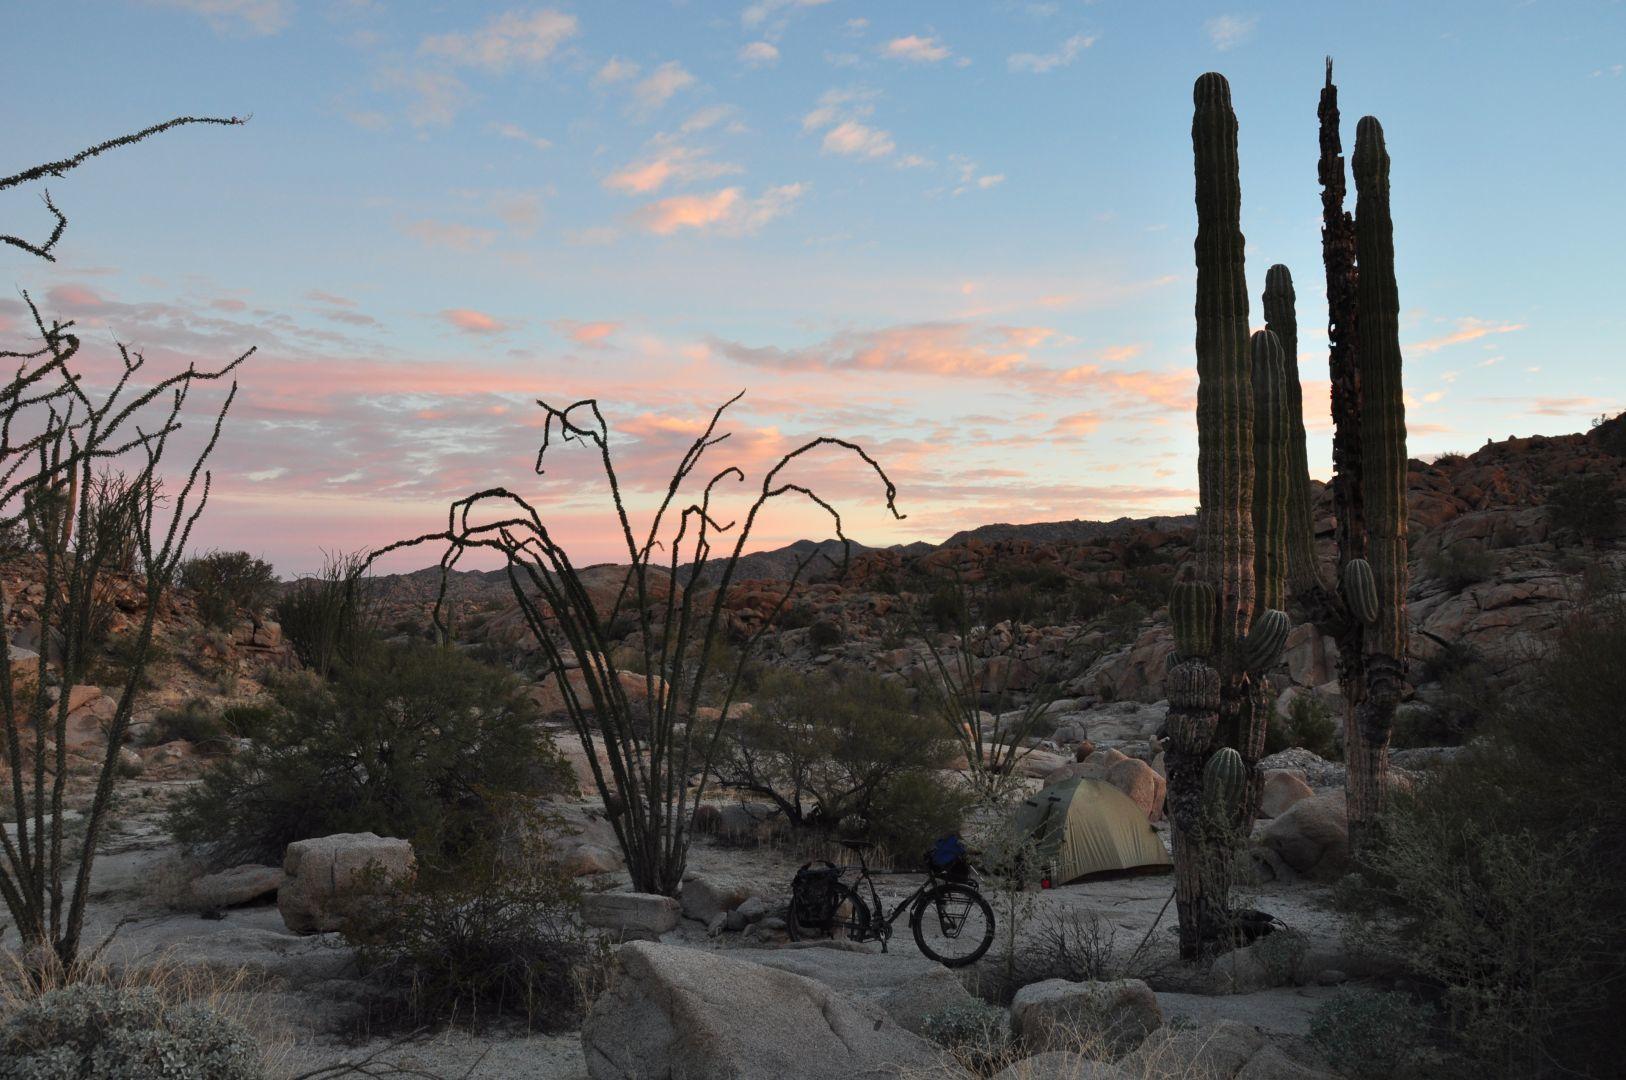 in cactus field